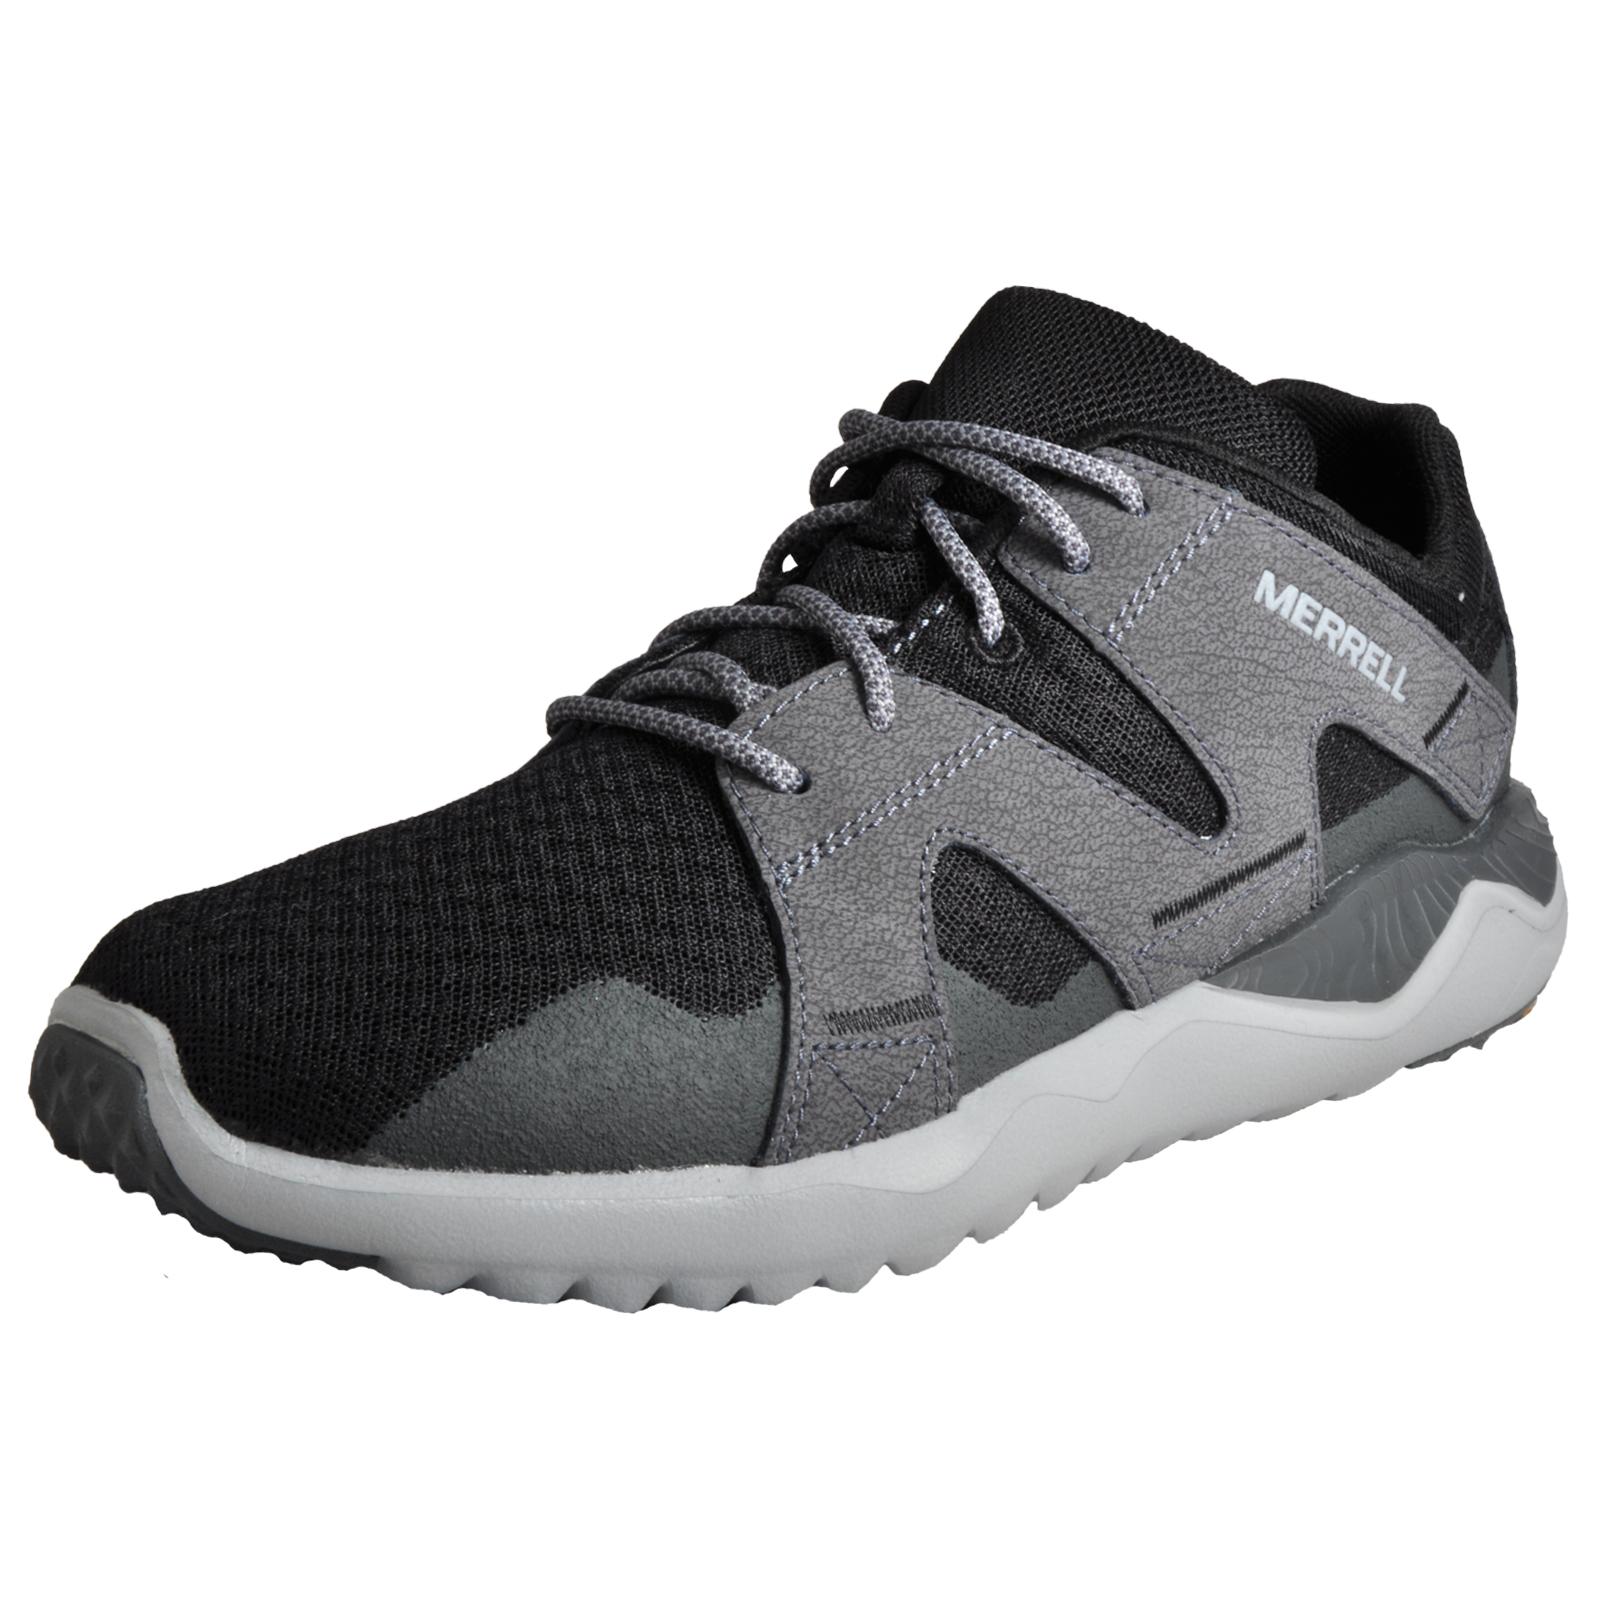 Merrell J91355 Sneakers Hombre BLACK 43.5 ARl7LjF